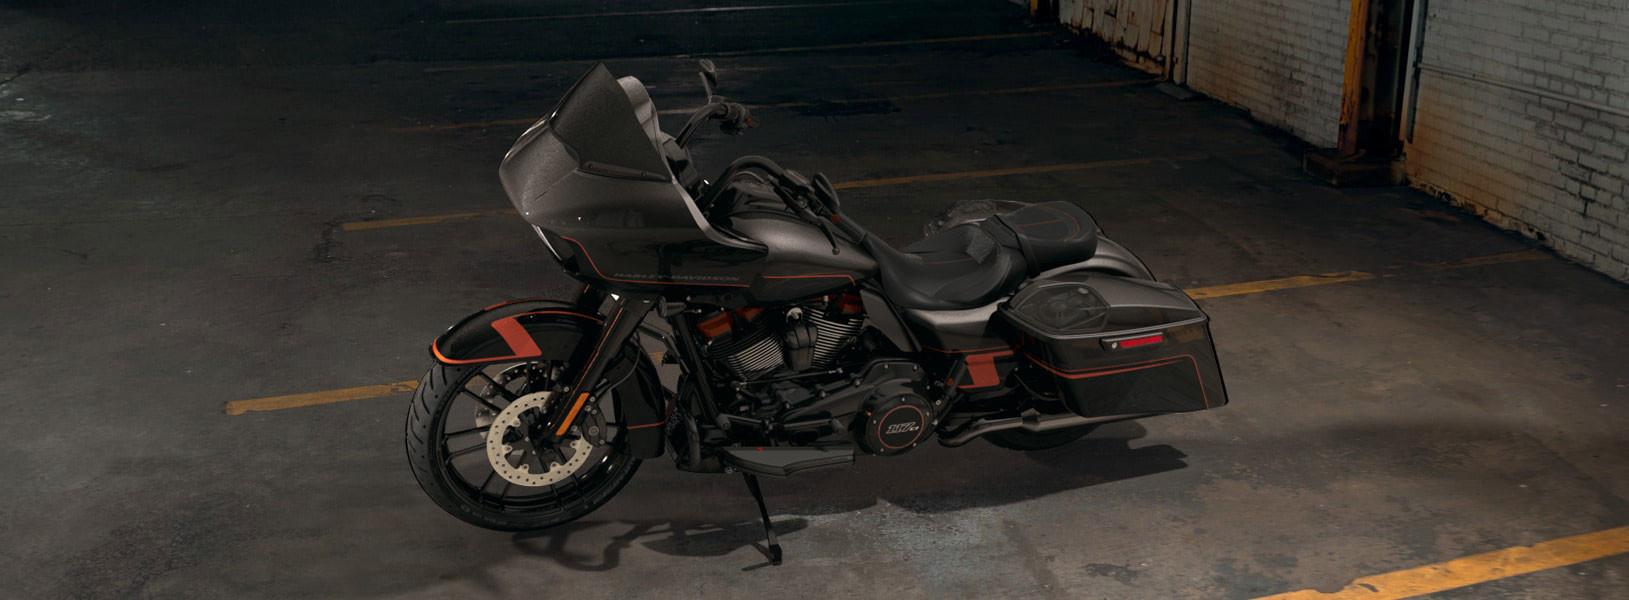 CVO™ Road Glide®   Freedom Valley Harley-Davidson®